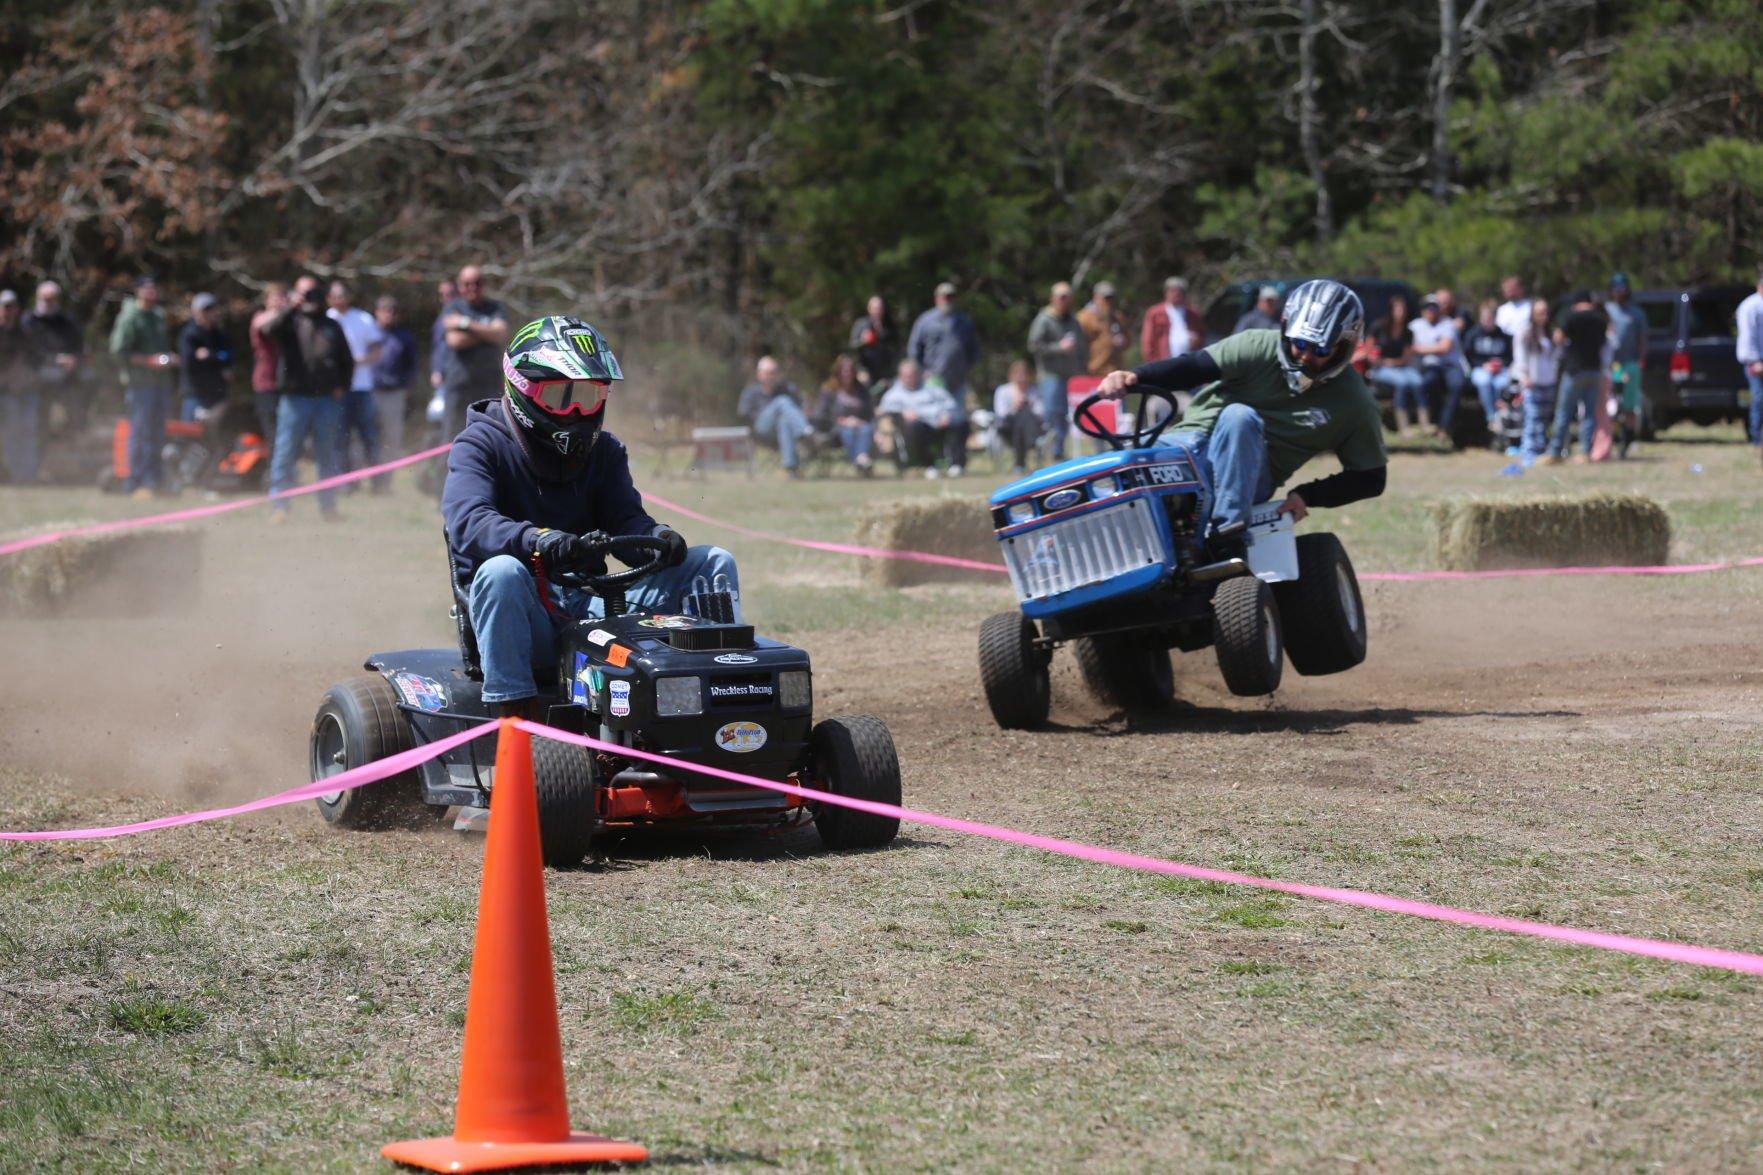 Lawn Mower Racing Makes A Comeback In Ocean County Latest Headlines Pressofatlanticcity Com